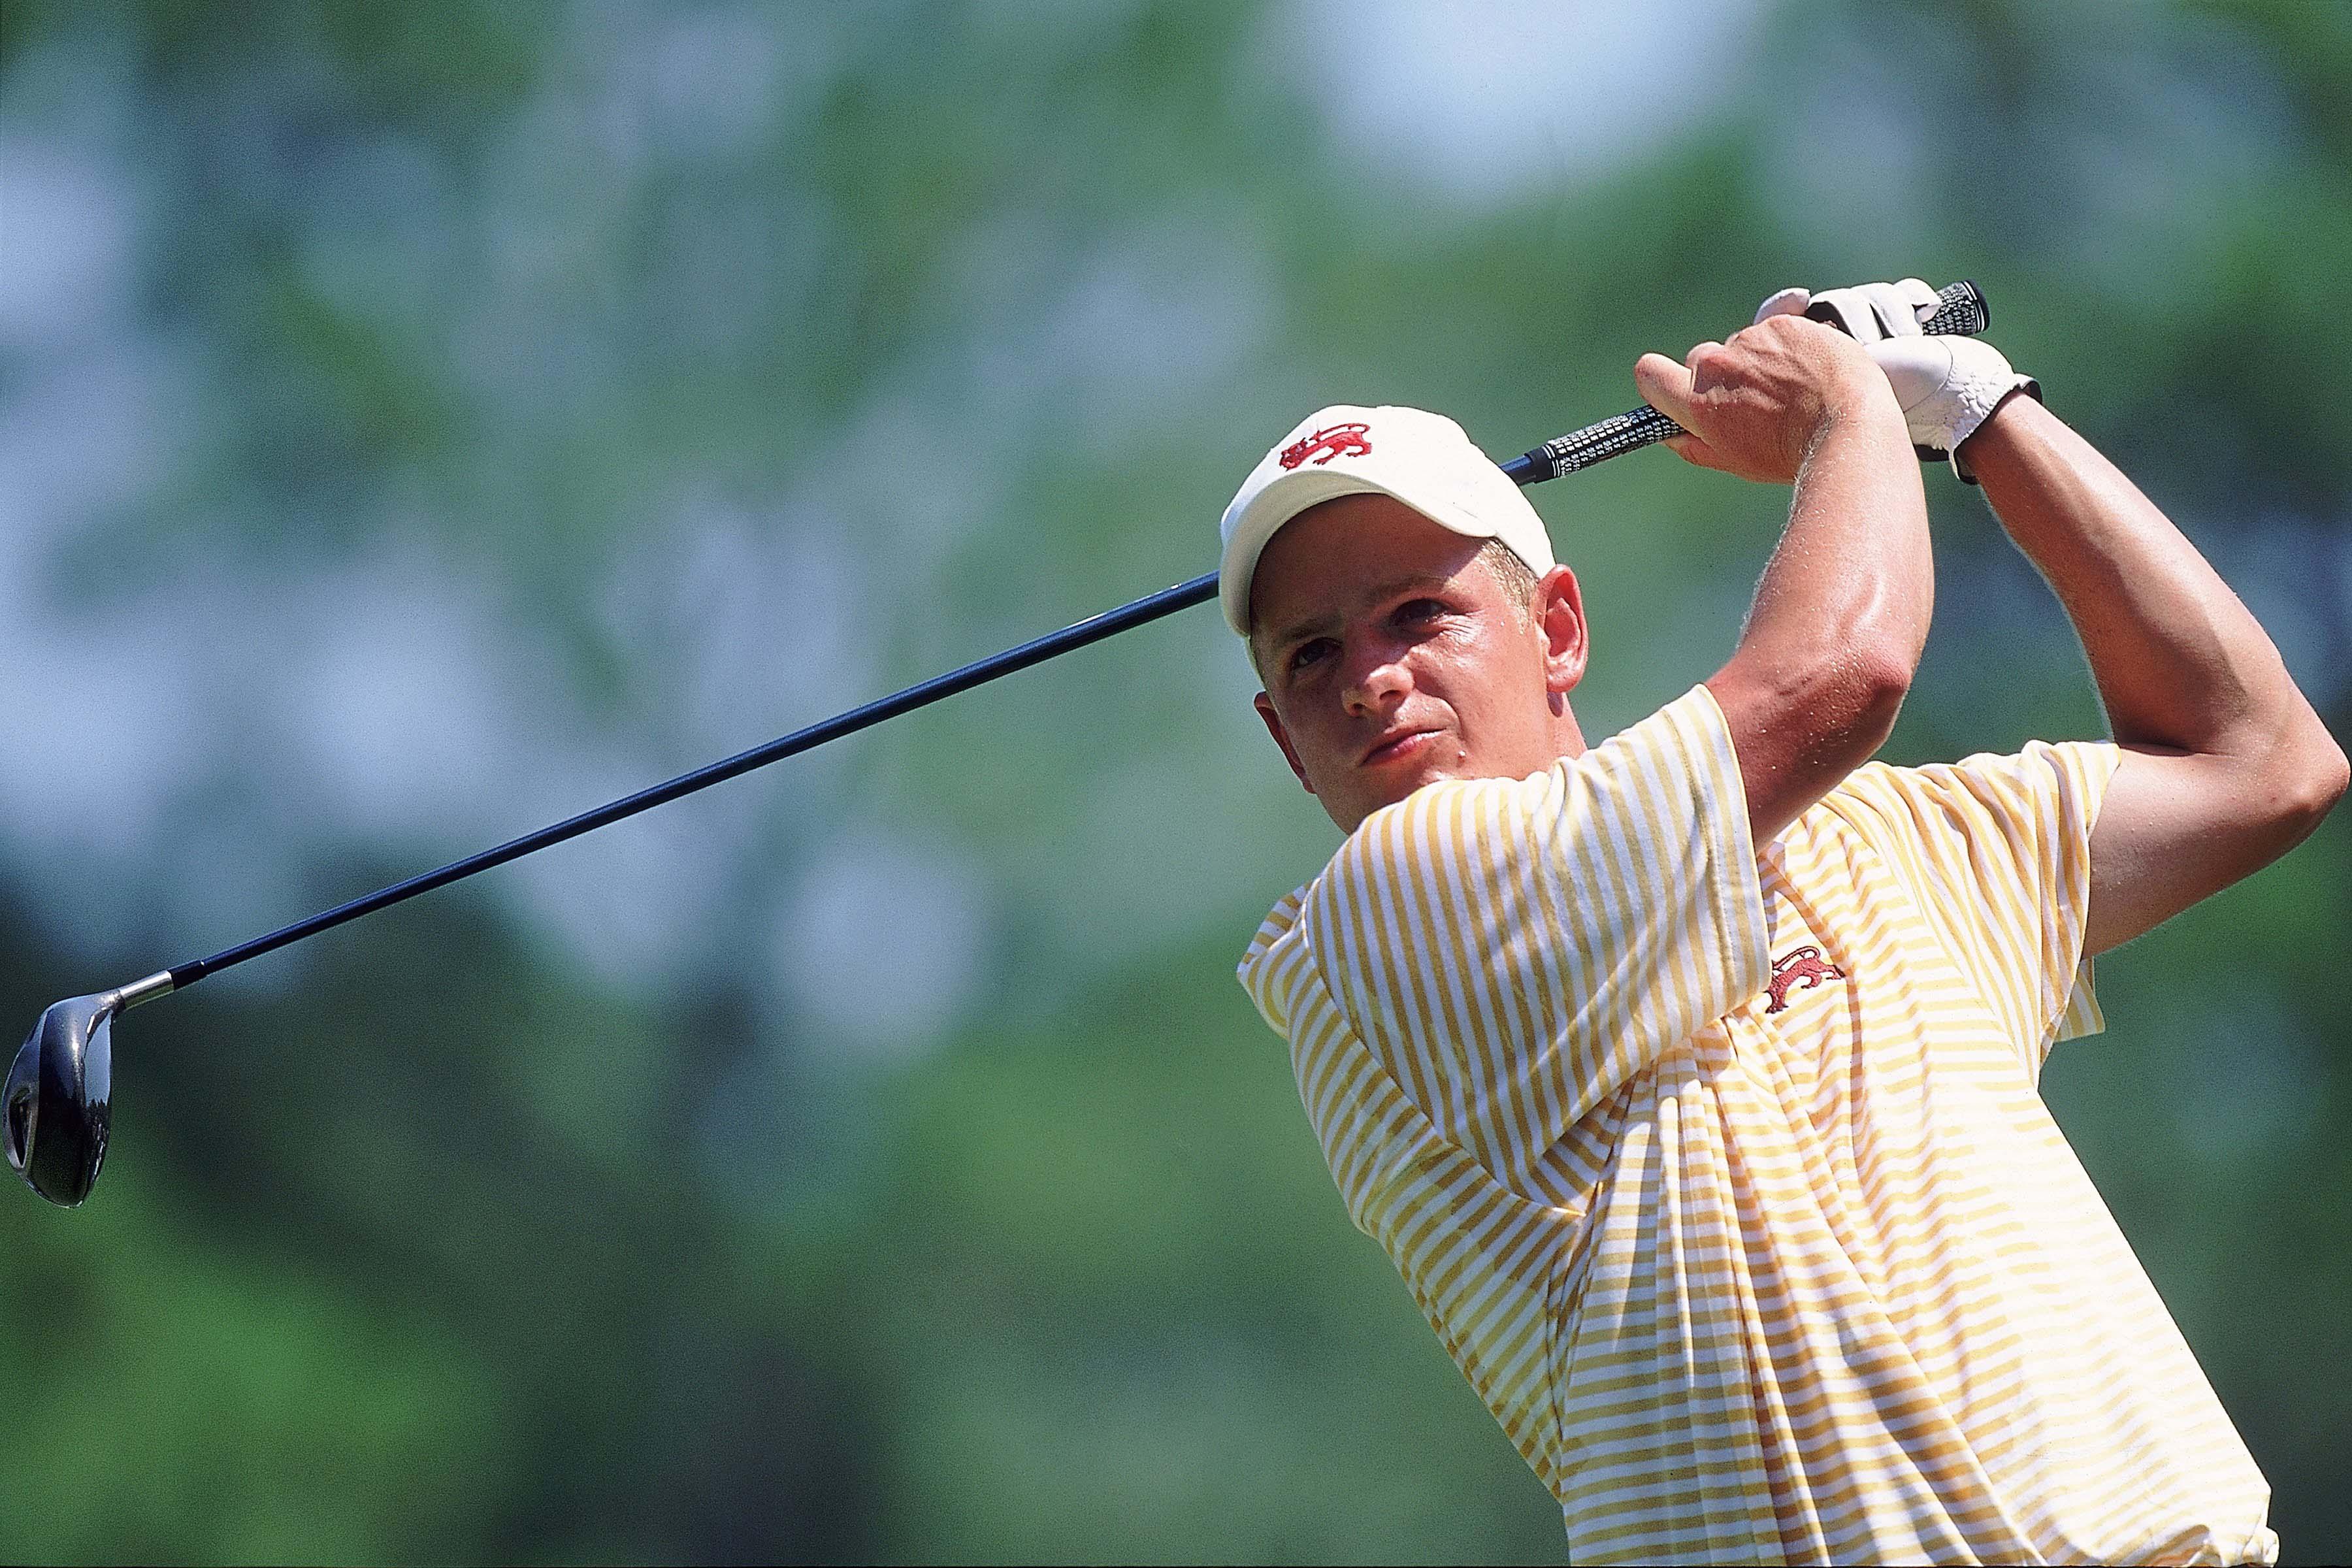 1999 - Luke Donald, Northwestern